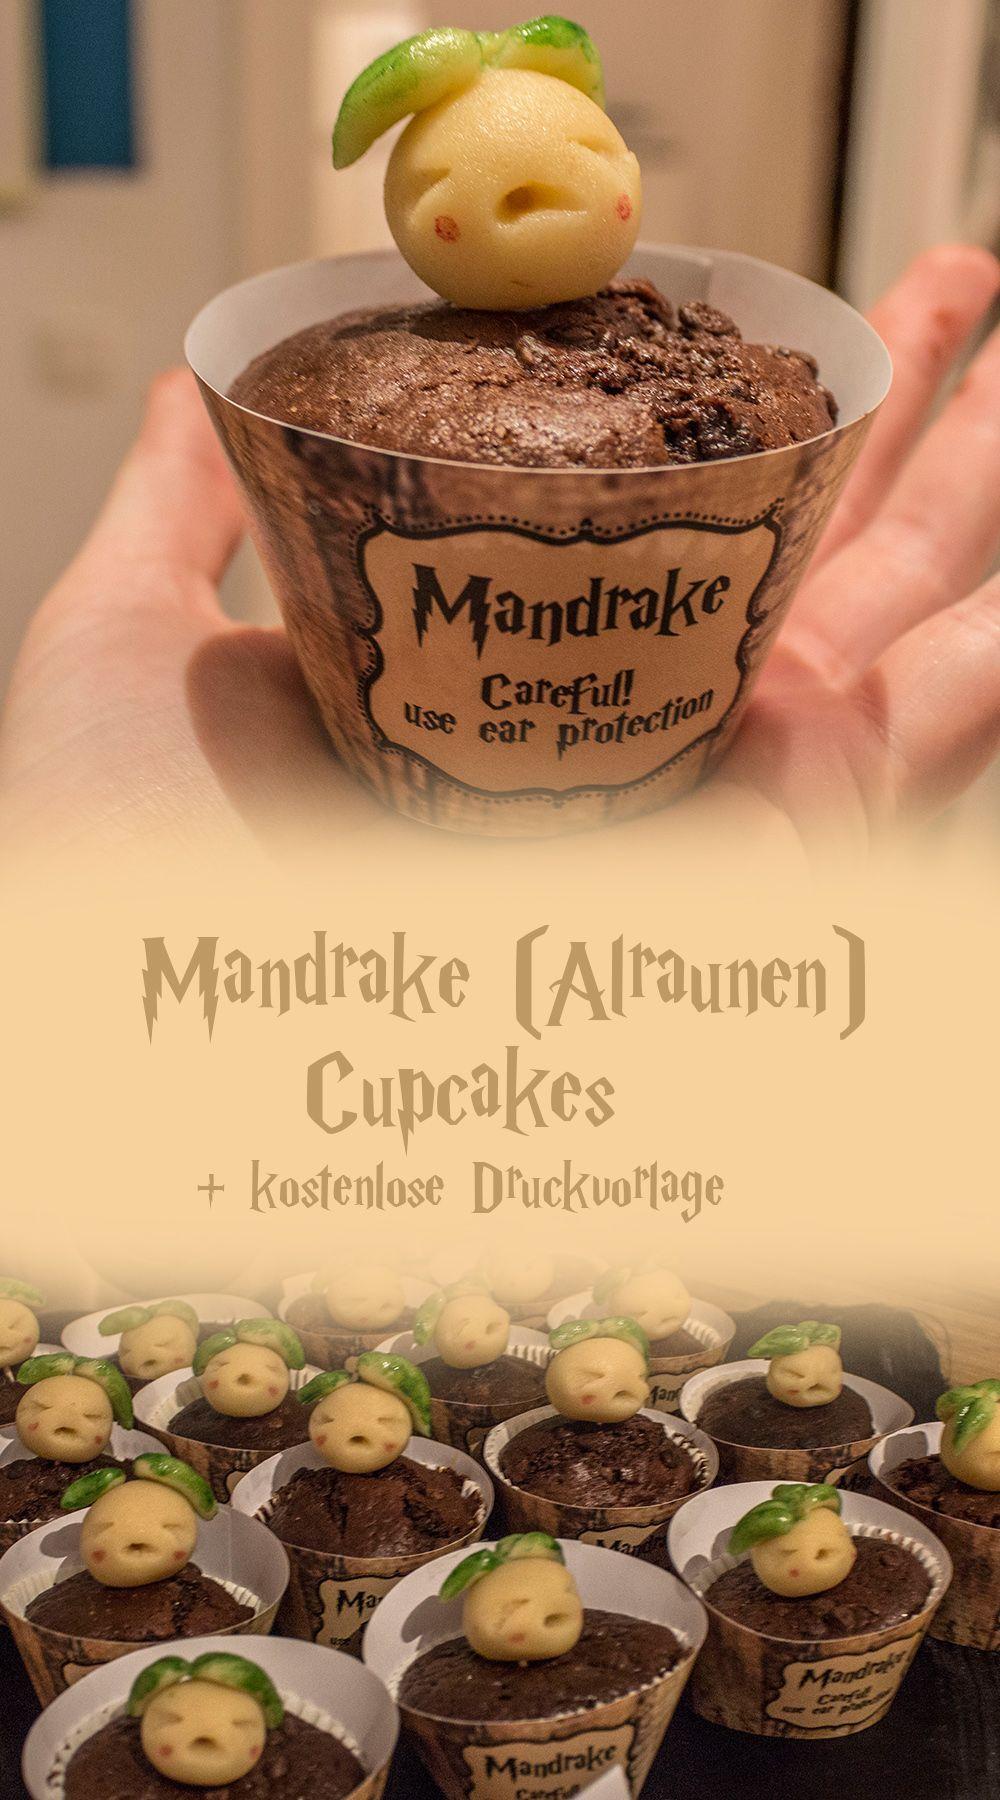 Mandrake (Alraunen) Cupcakes Rezept!! Perfekt für jede Harry Potter Party! Leck…